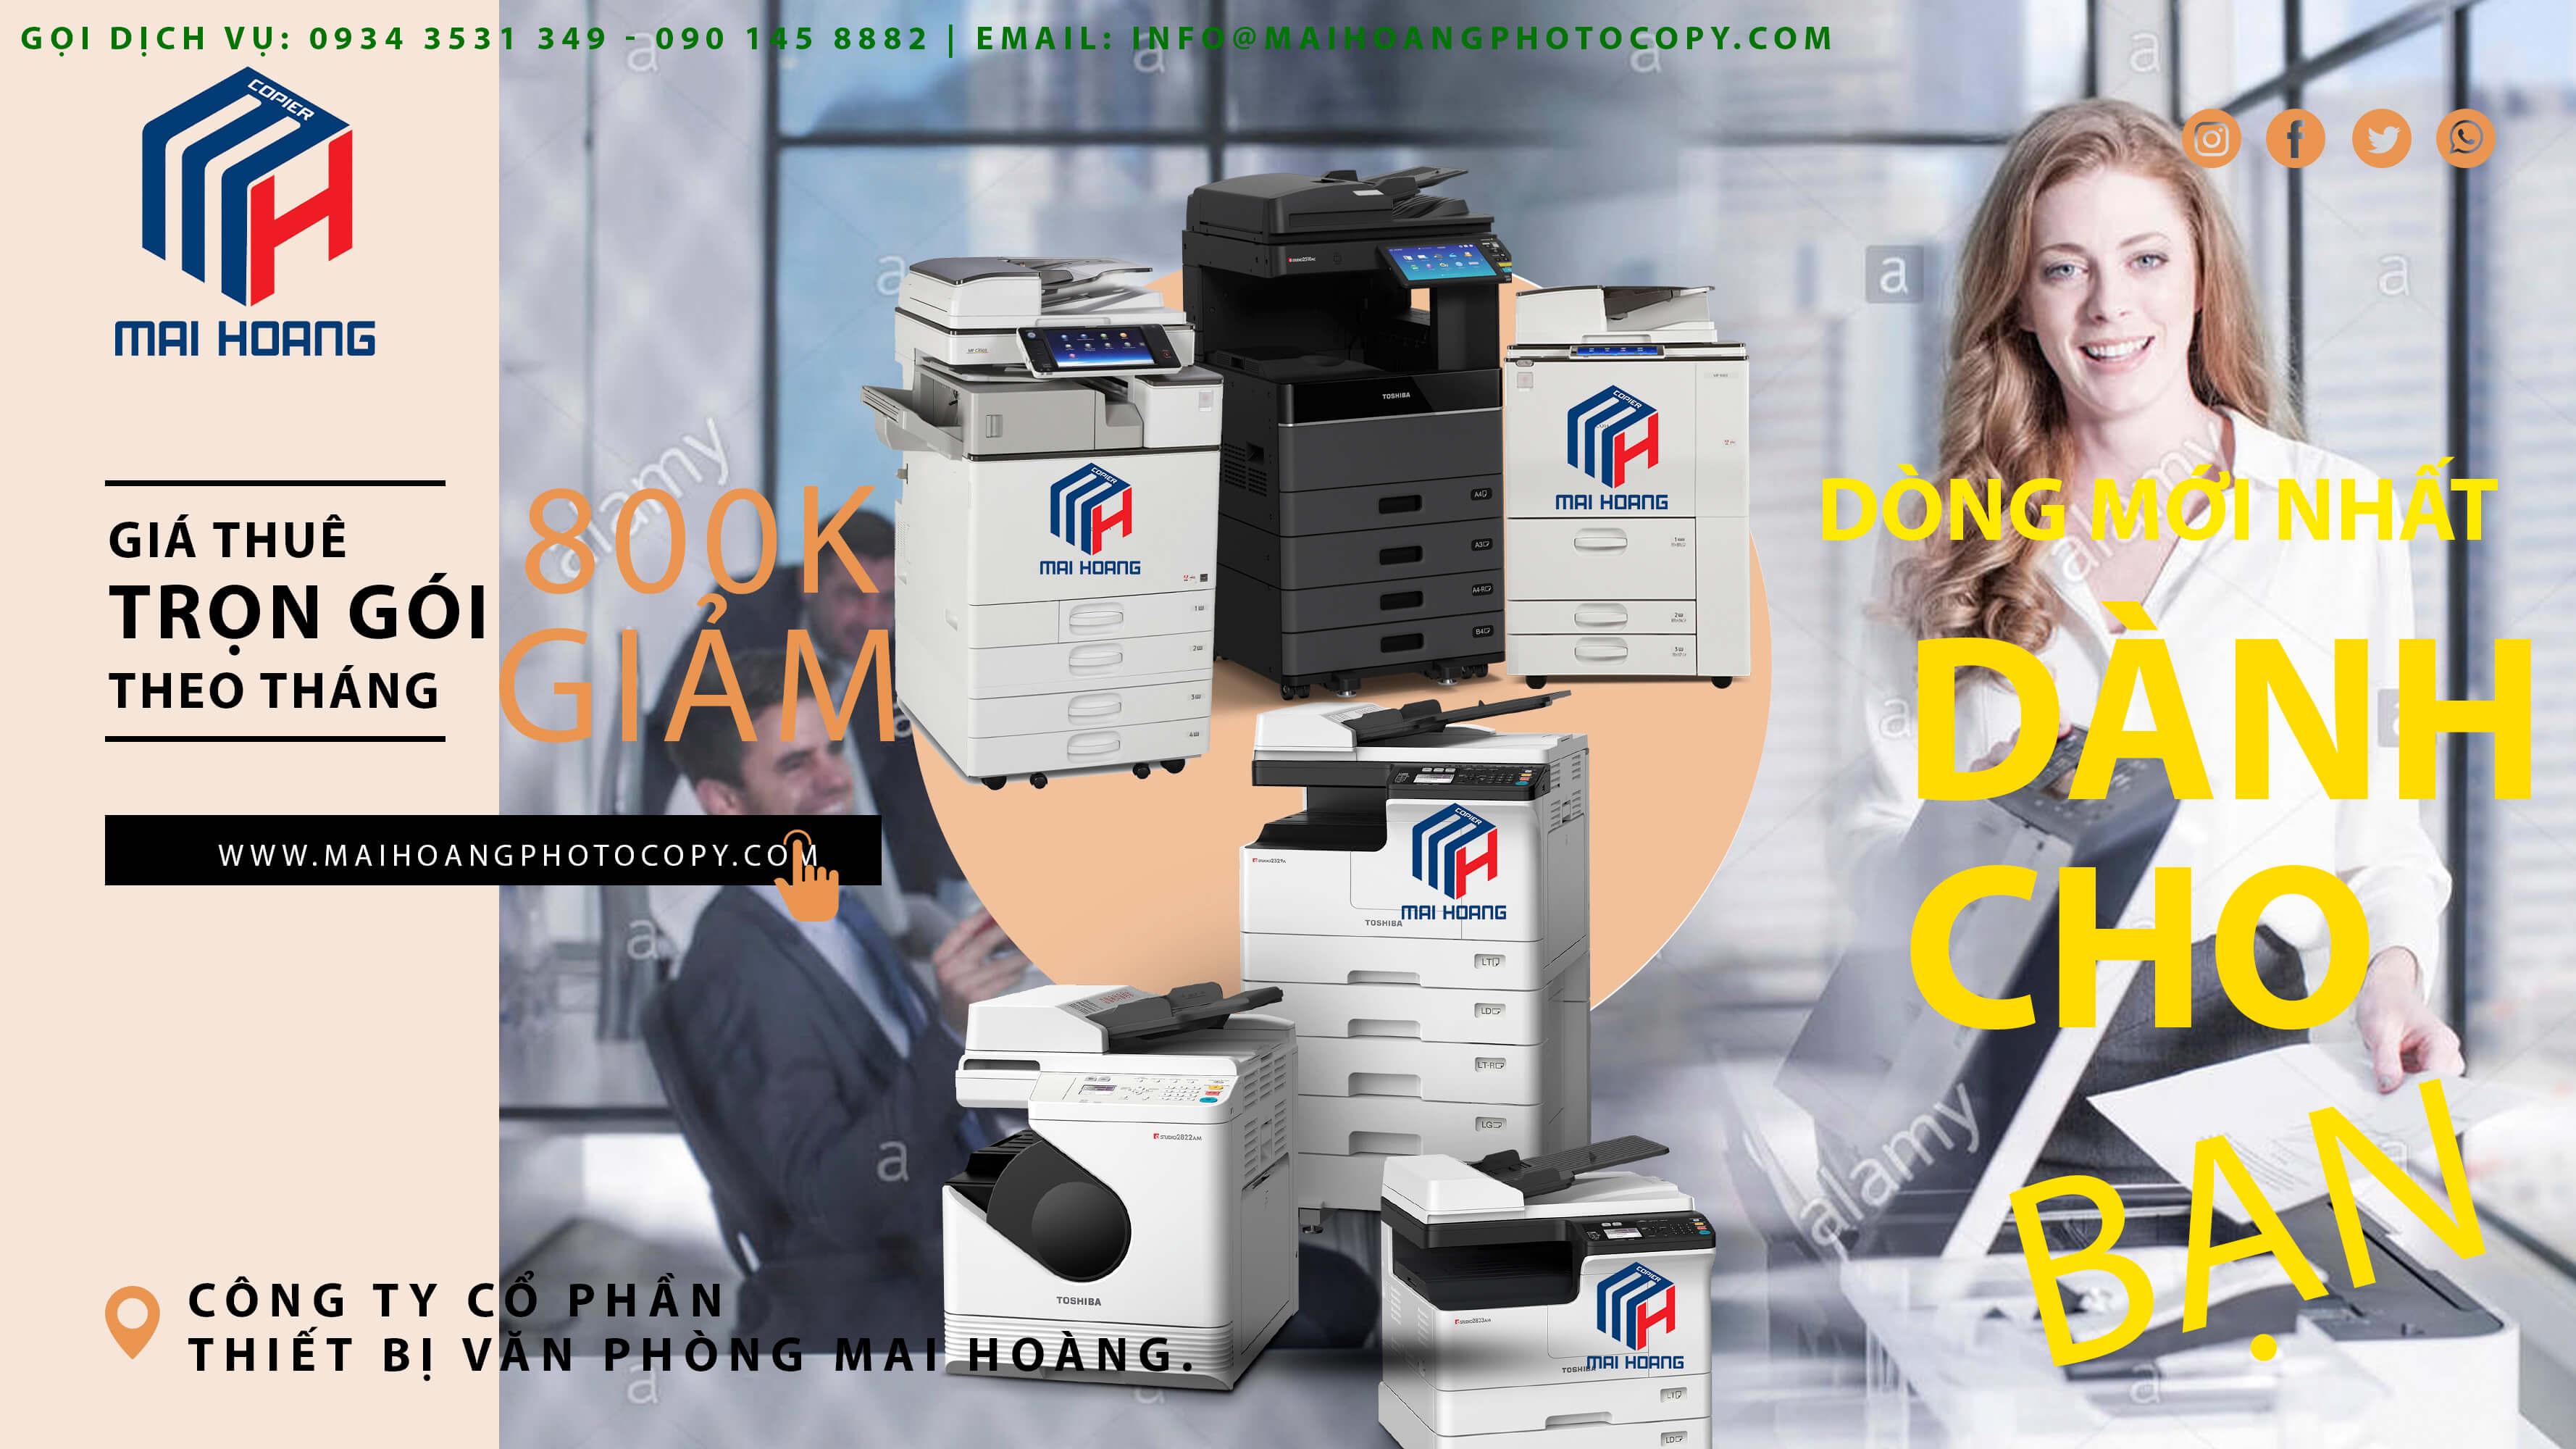 Cho Thuê Máy Photocopy Màu Đa Chức Năng Ricoh Aficio MP C4504